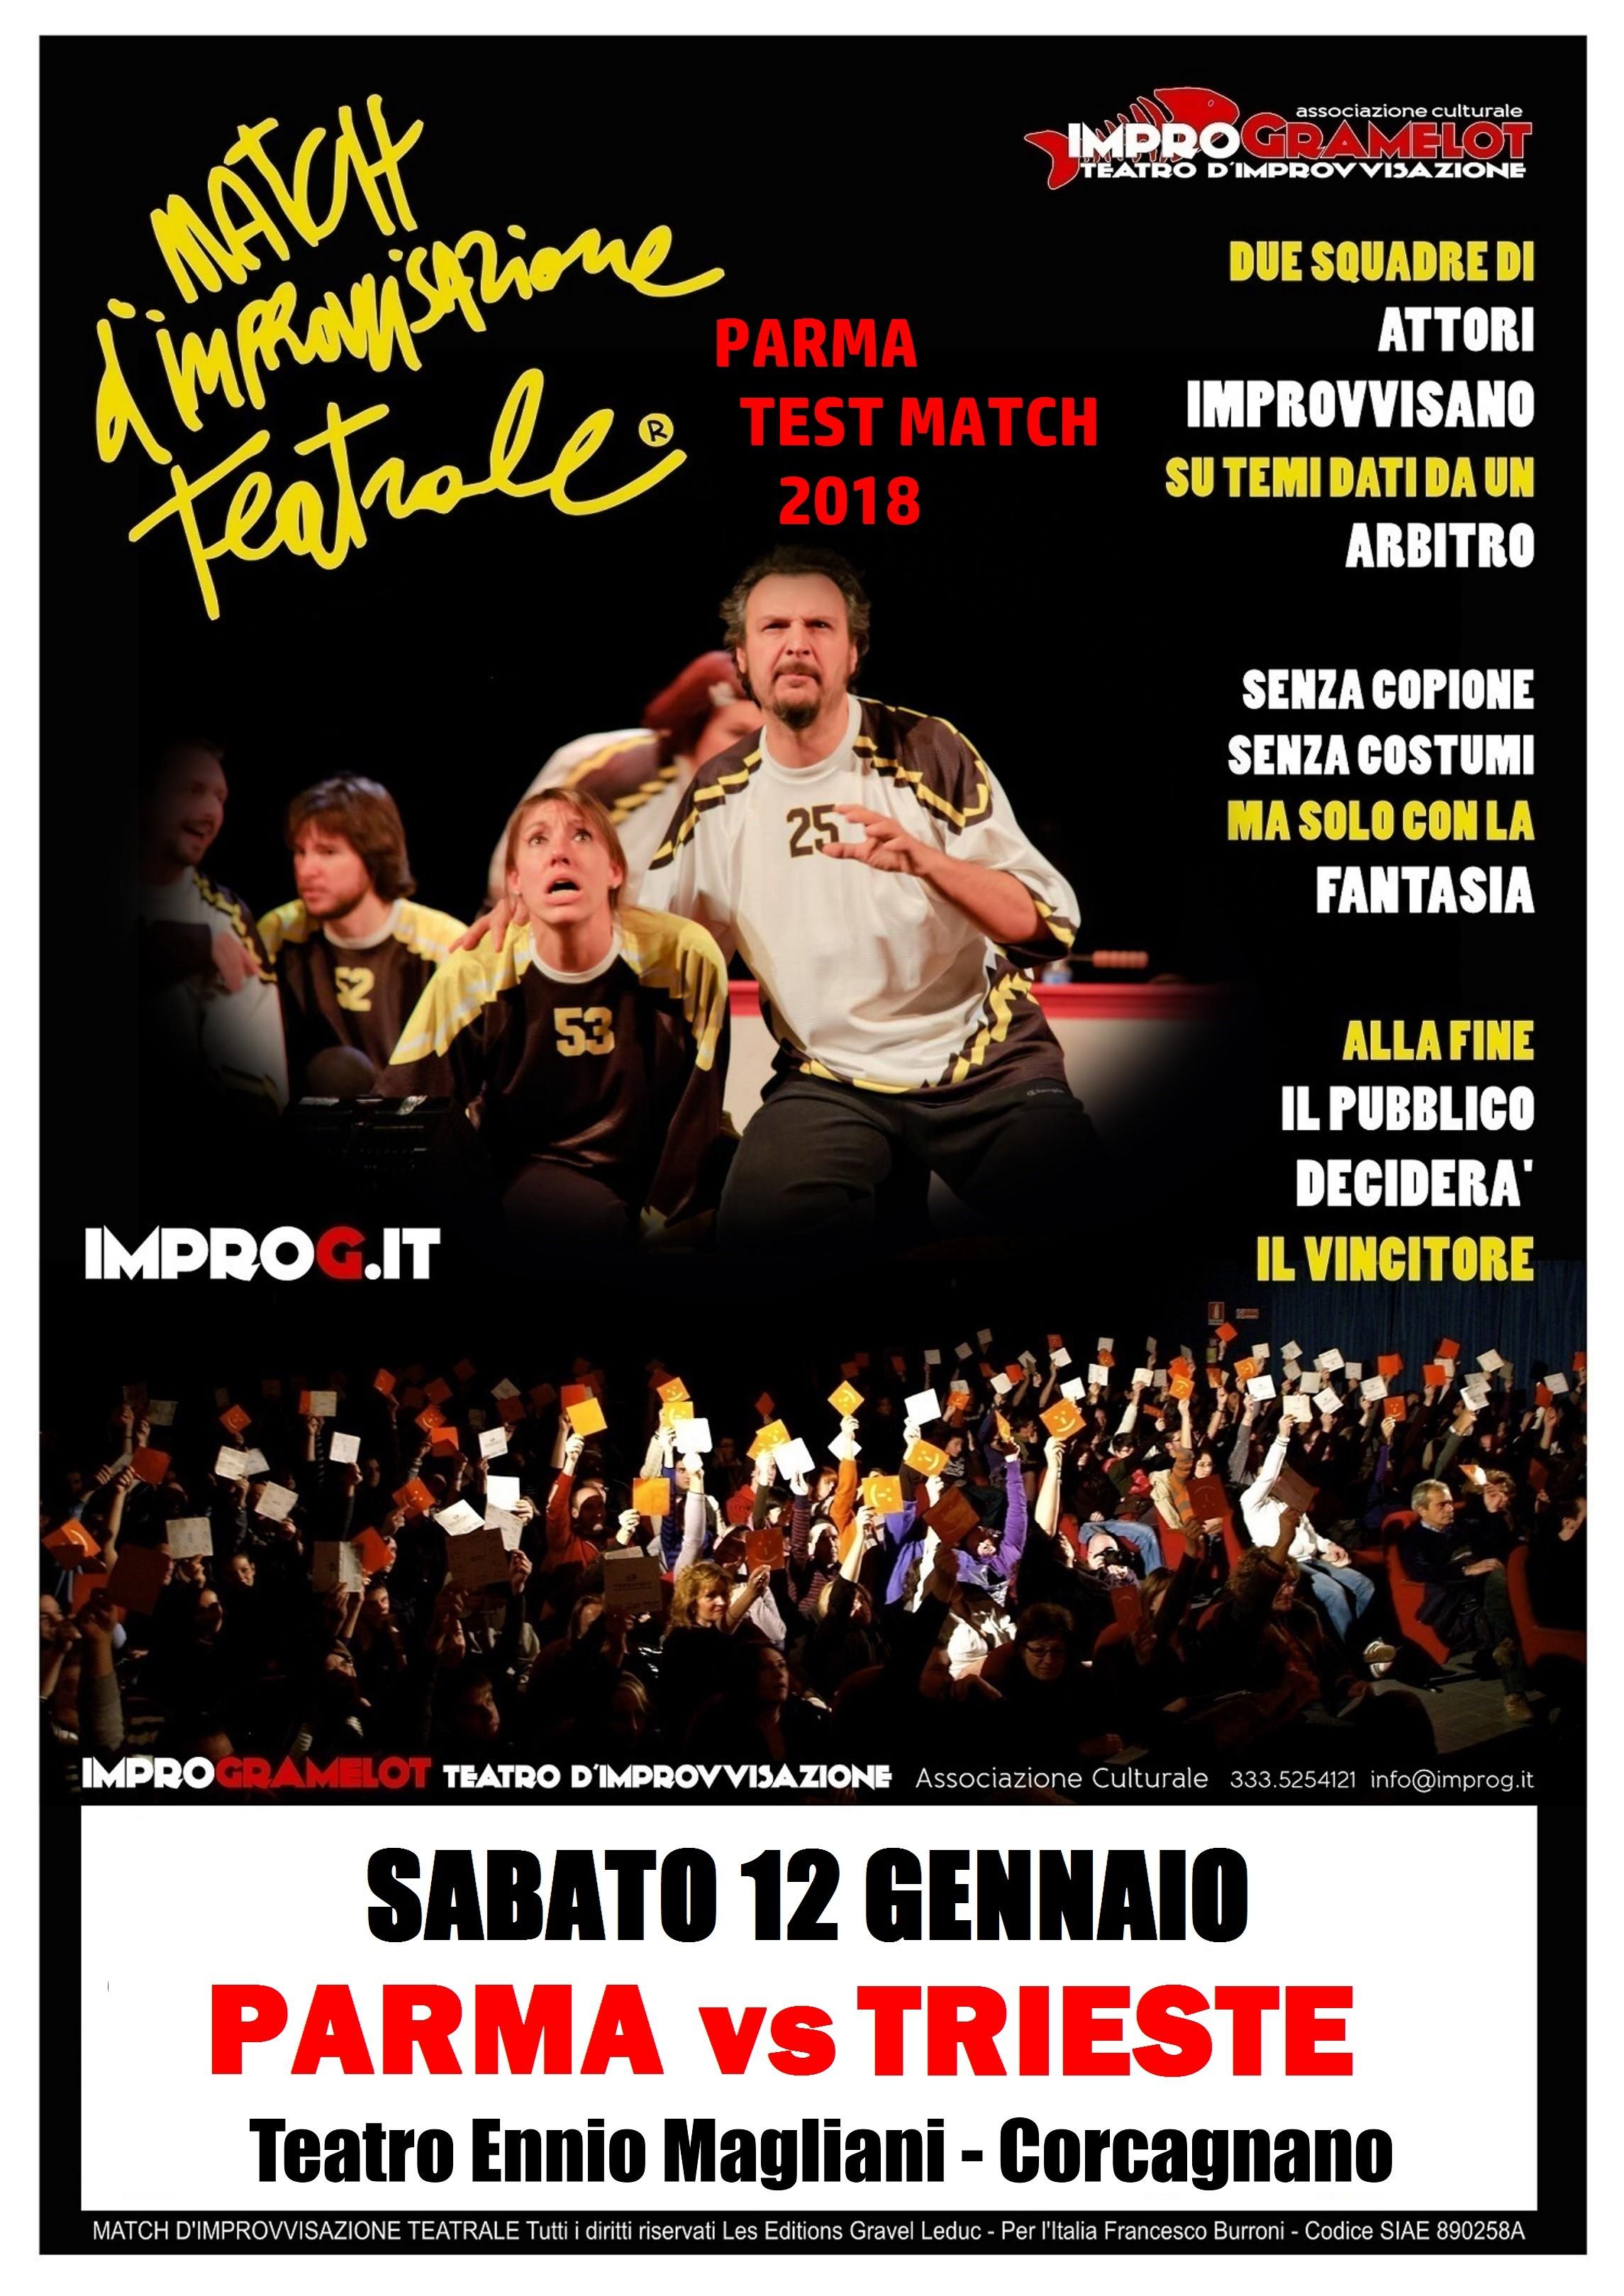 Match d'improvvisazione teatrale al teatro Magliani: Parma vs Trieste